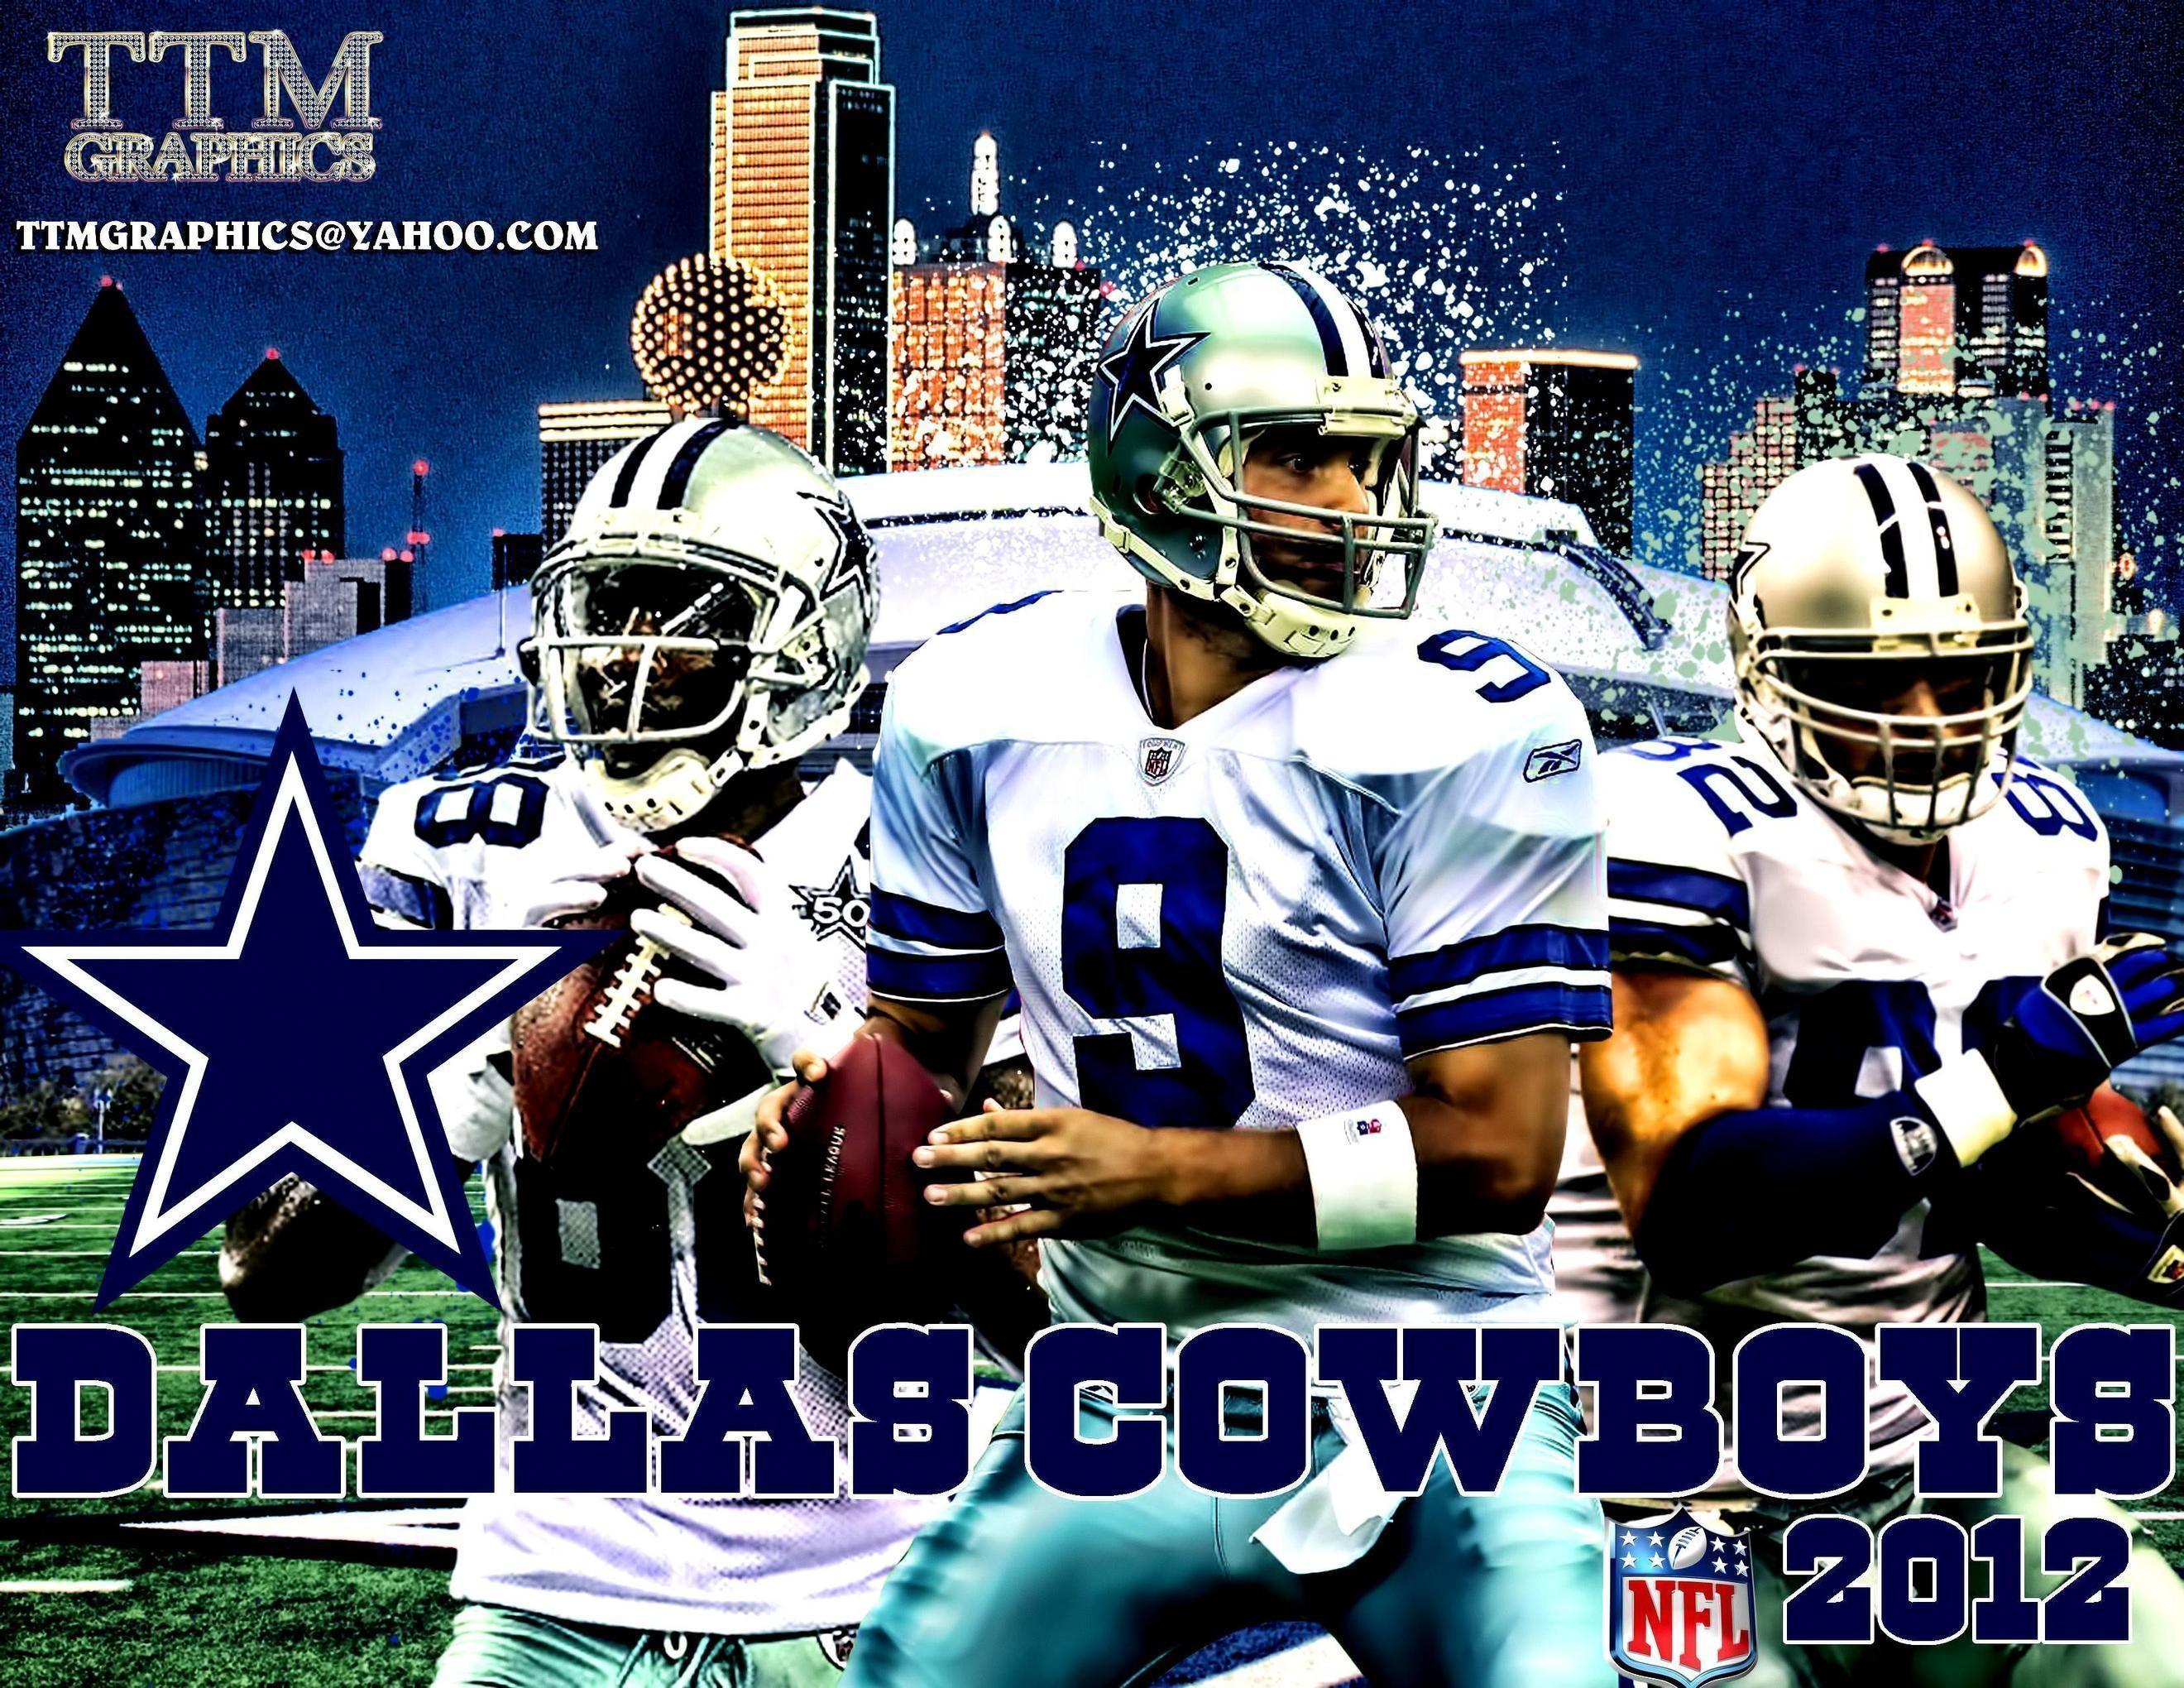 Football Dallas Cowboys Hd Background Wallpaper Wallpapers .